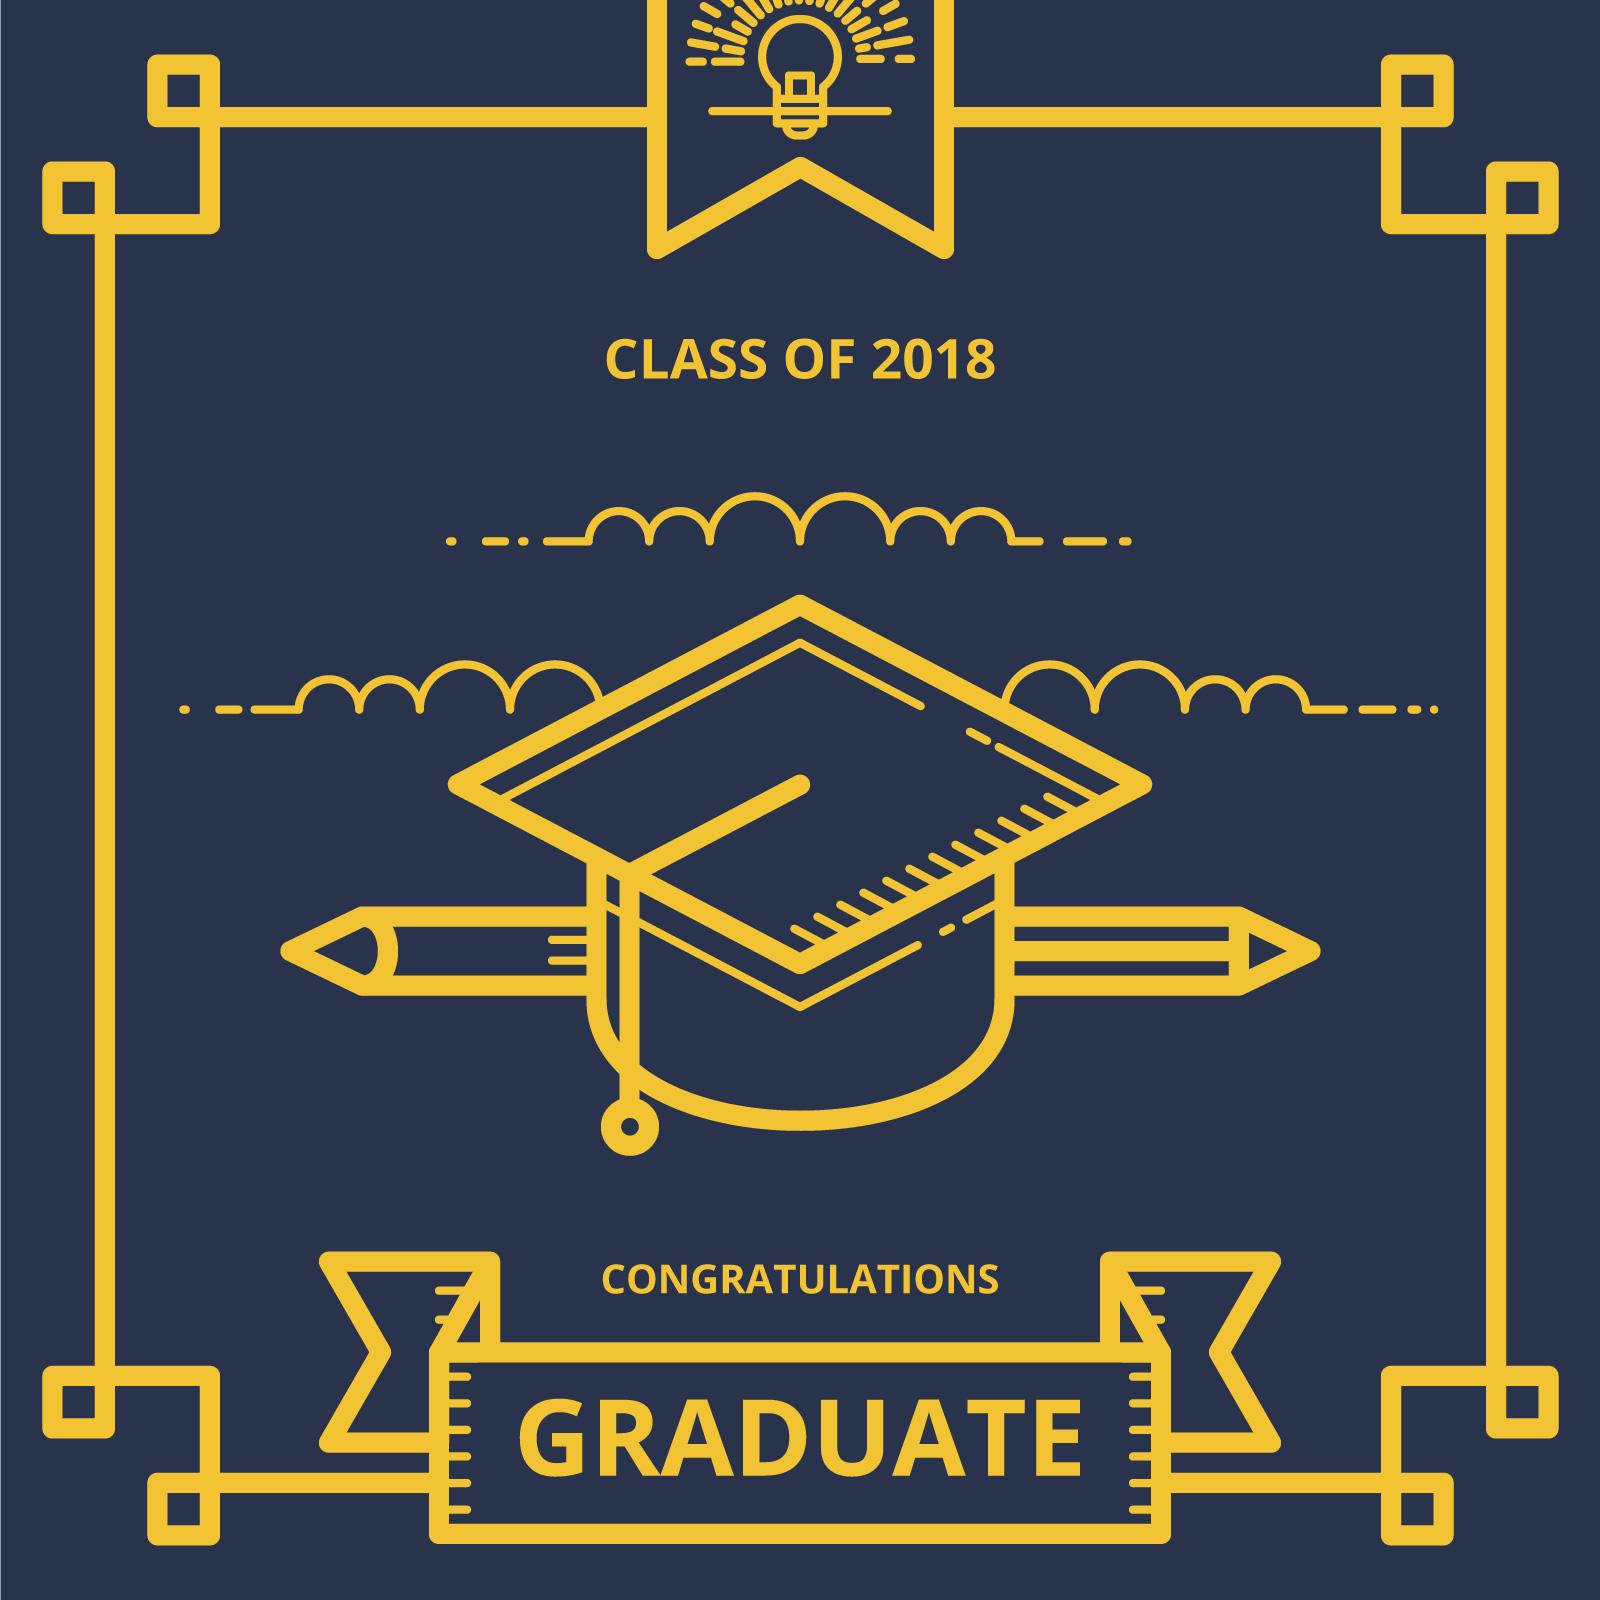 graduation card illustration greetings with graduation hat